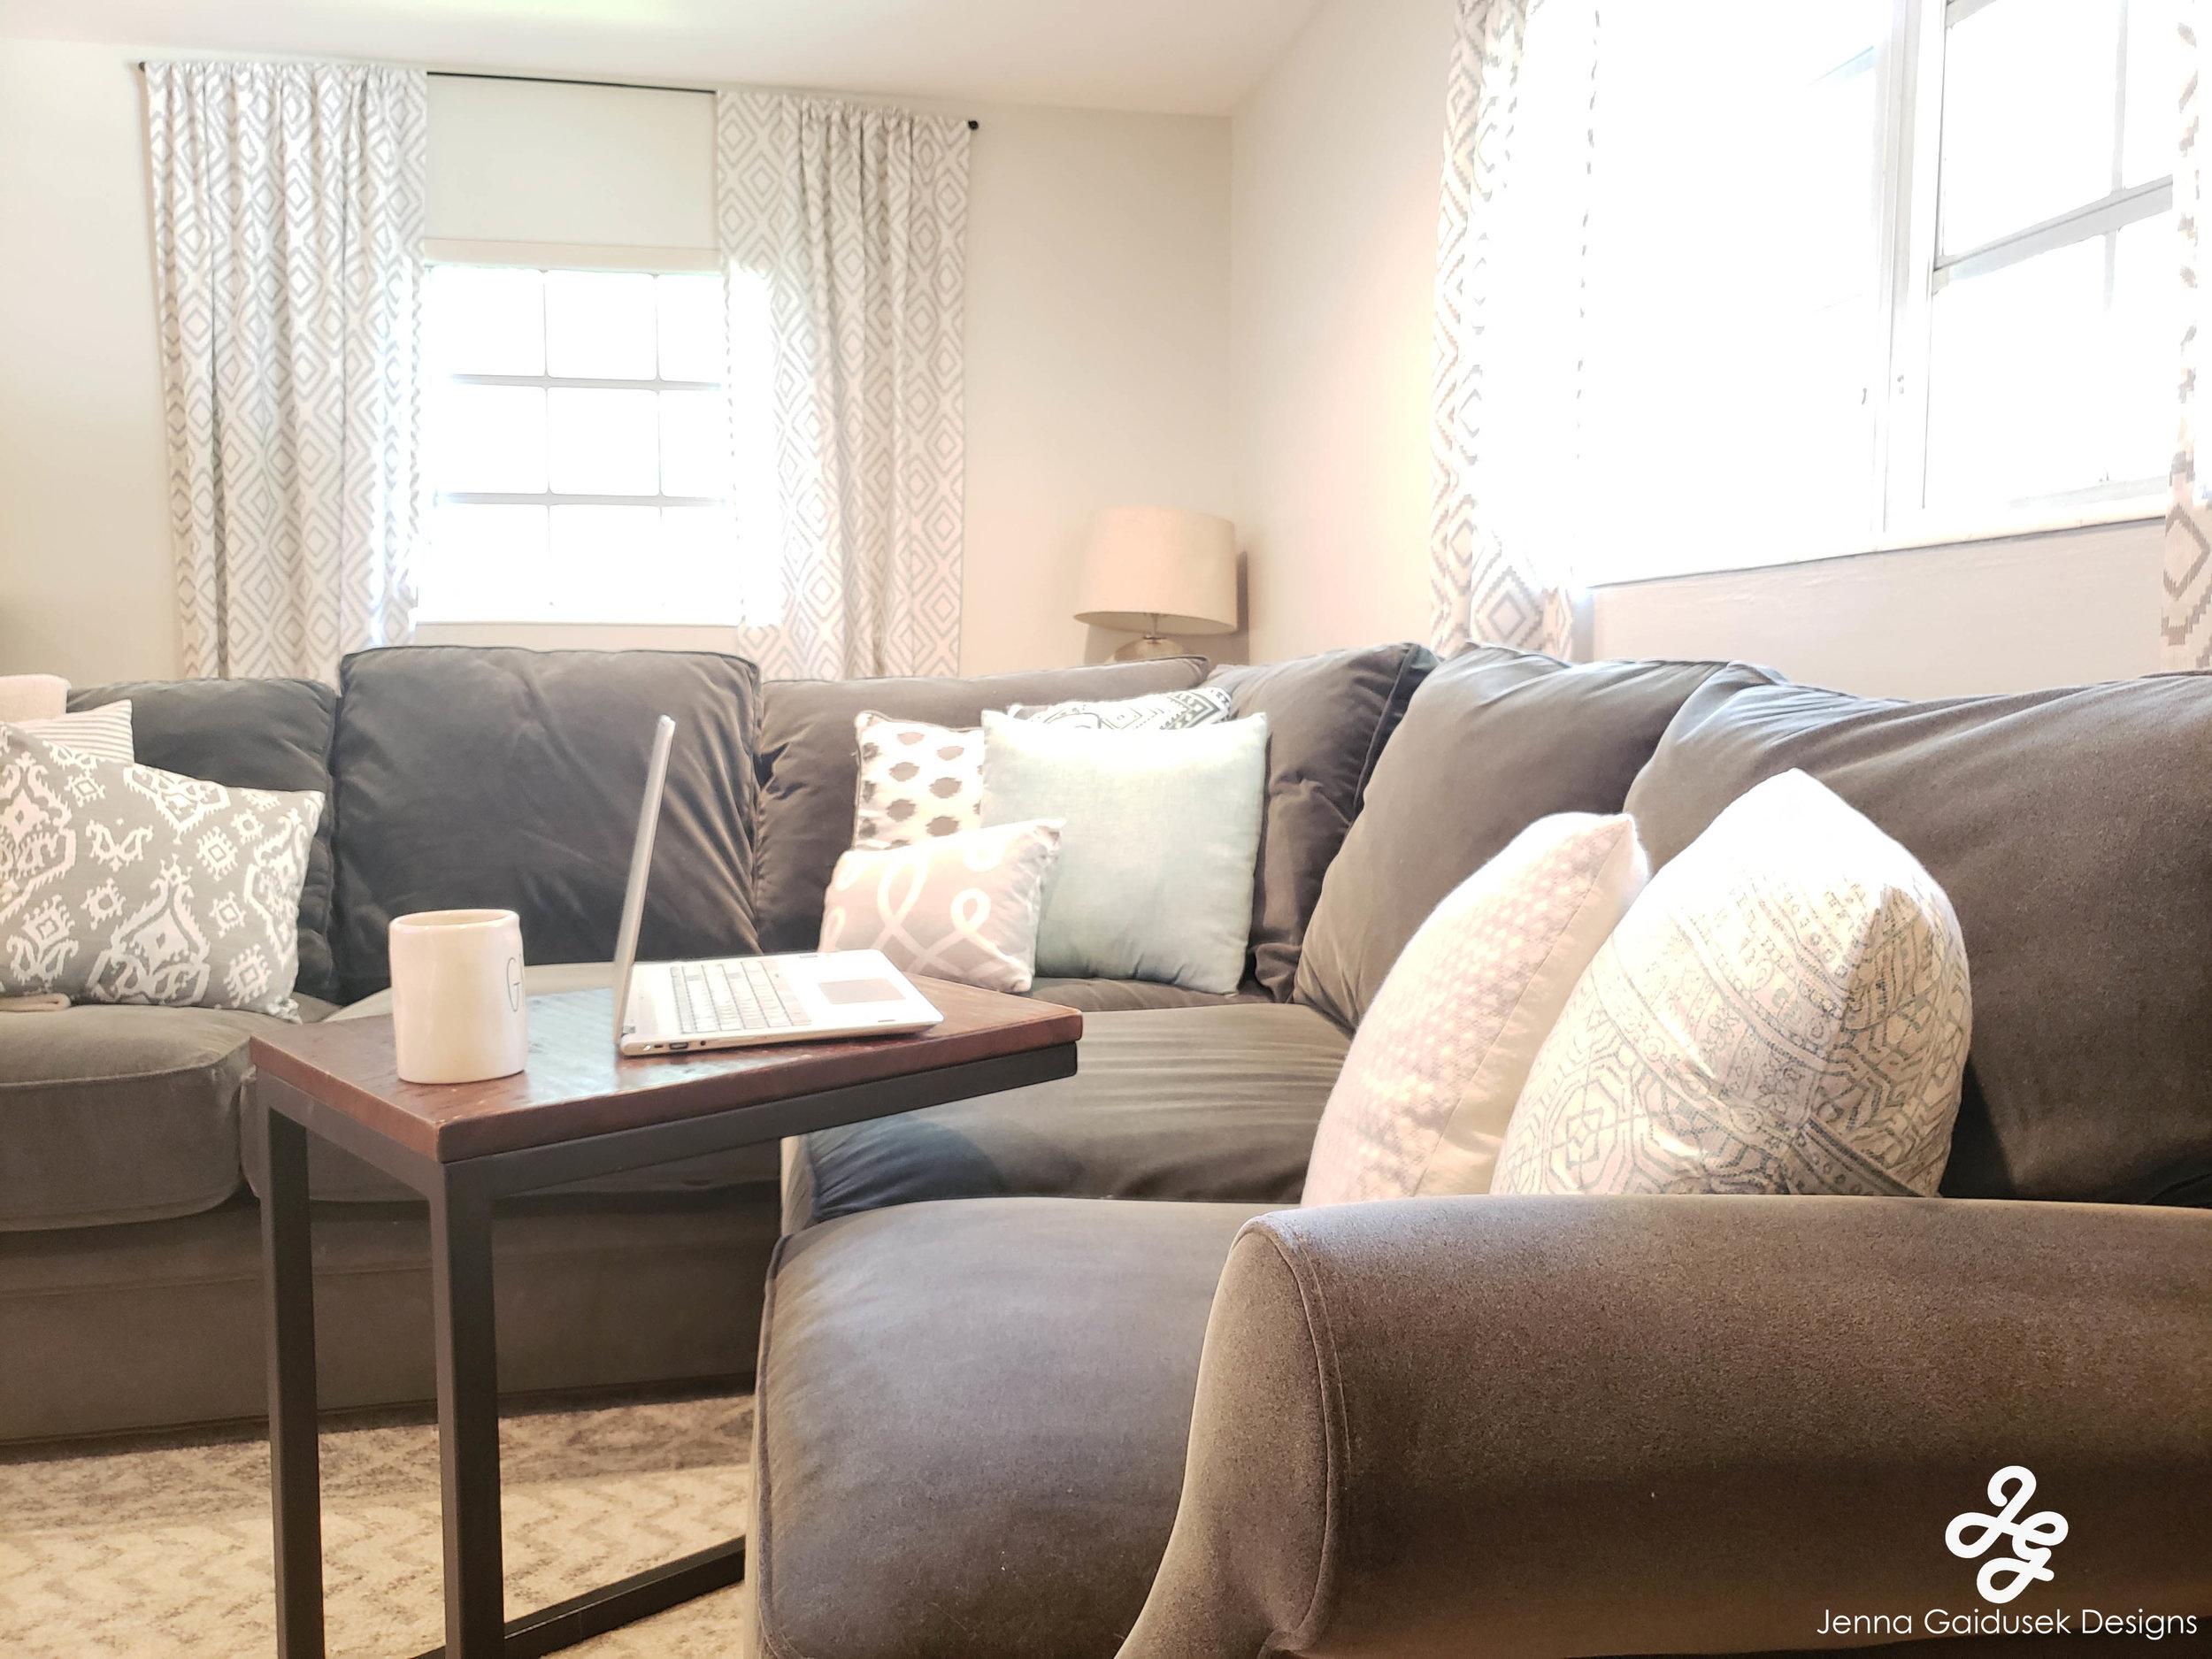 LARGE GRAY SECTIONAL Kid friendly Living room- Refined modern farmhouse, grays- white, light blue, navy, charcoal.jpg